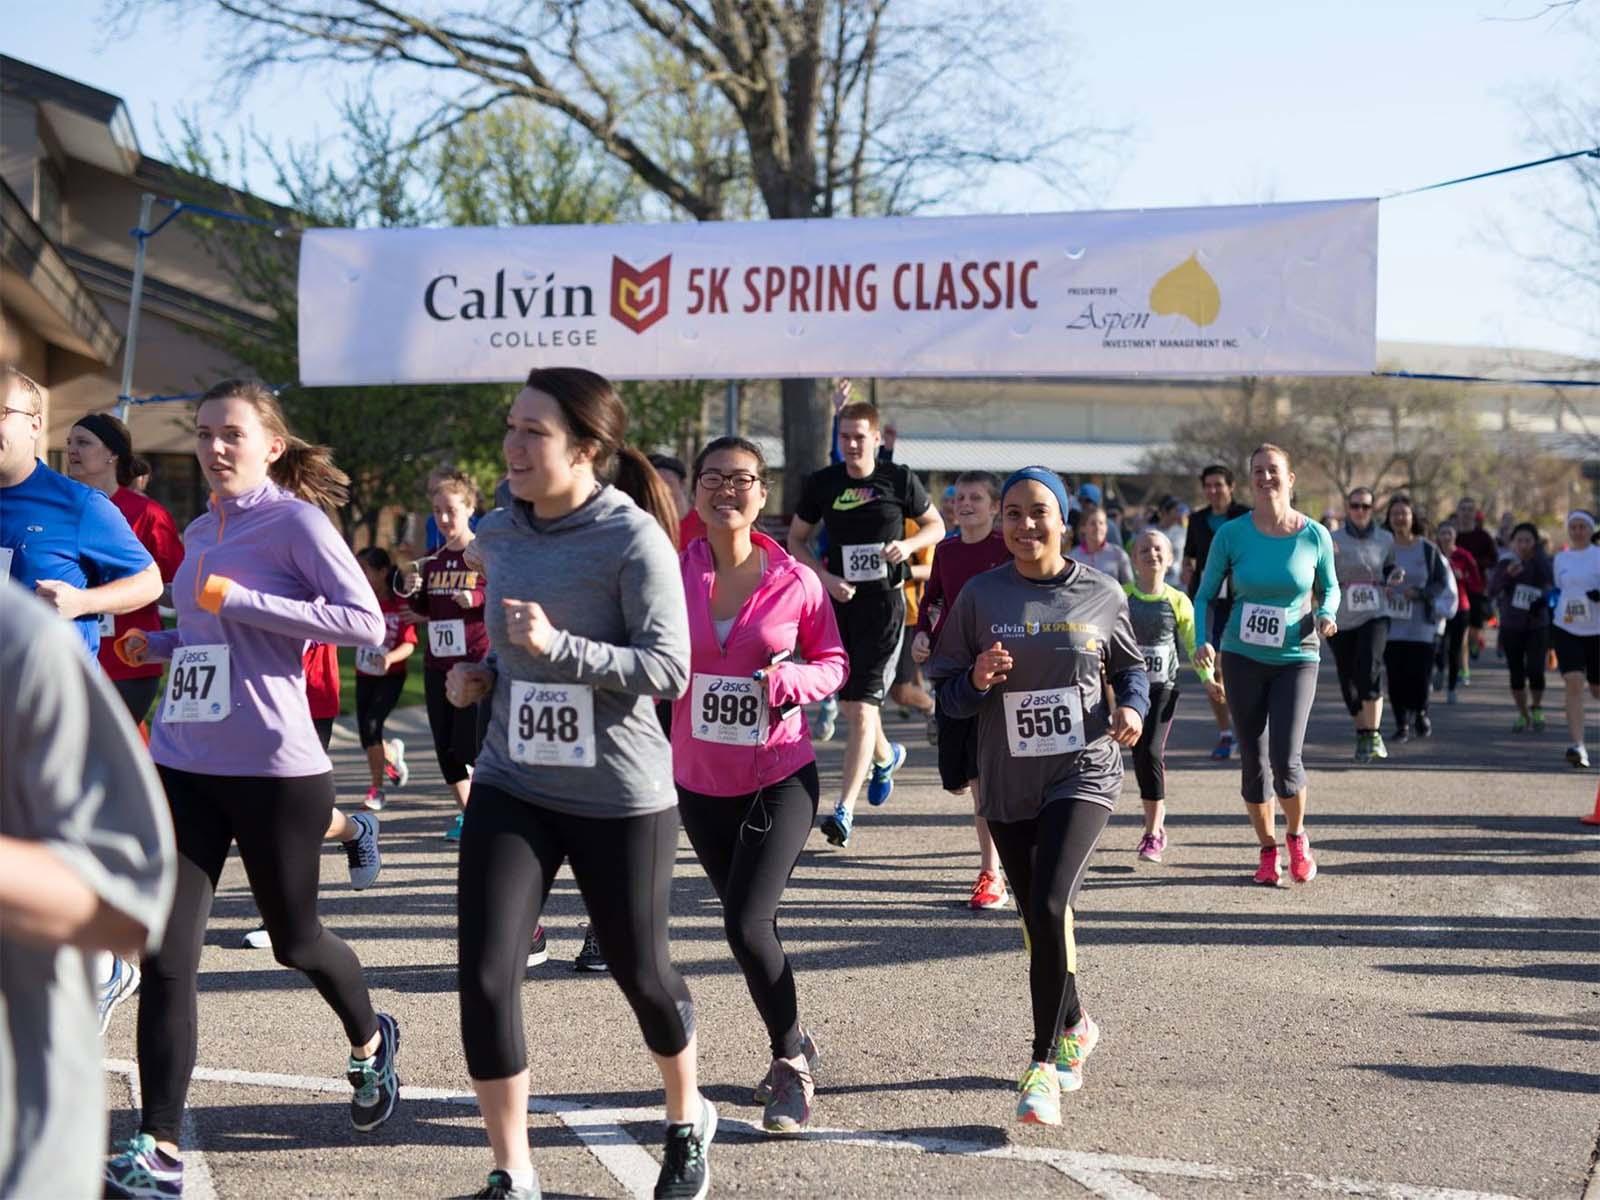 Calvin 5K Spring Classic - Events | Calvin College